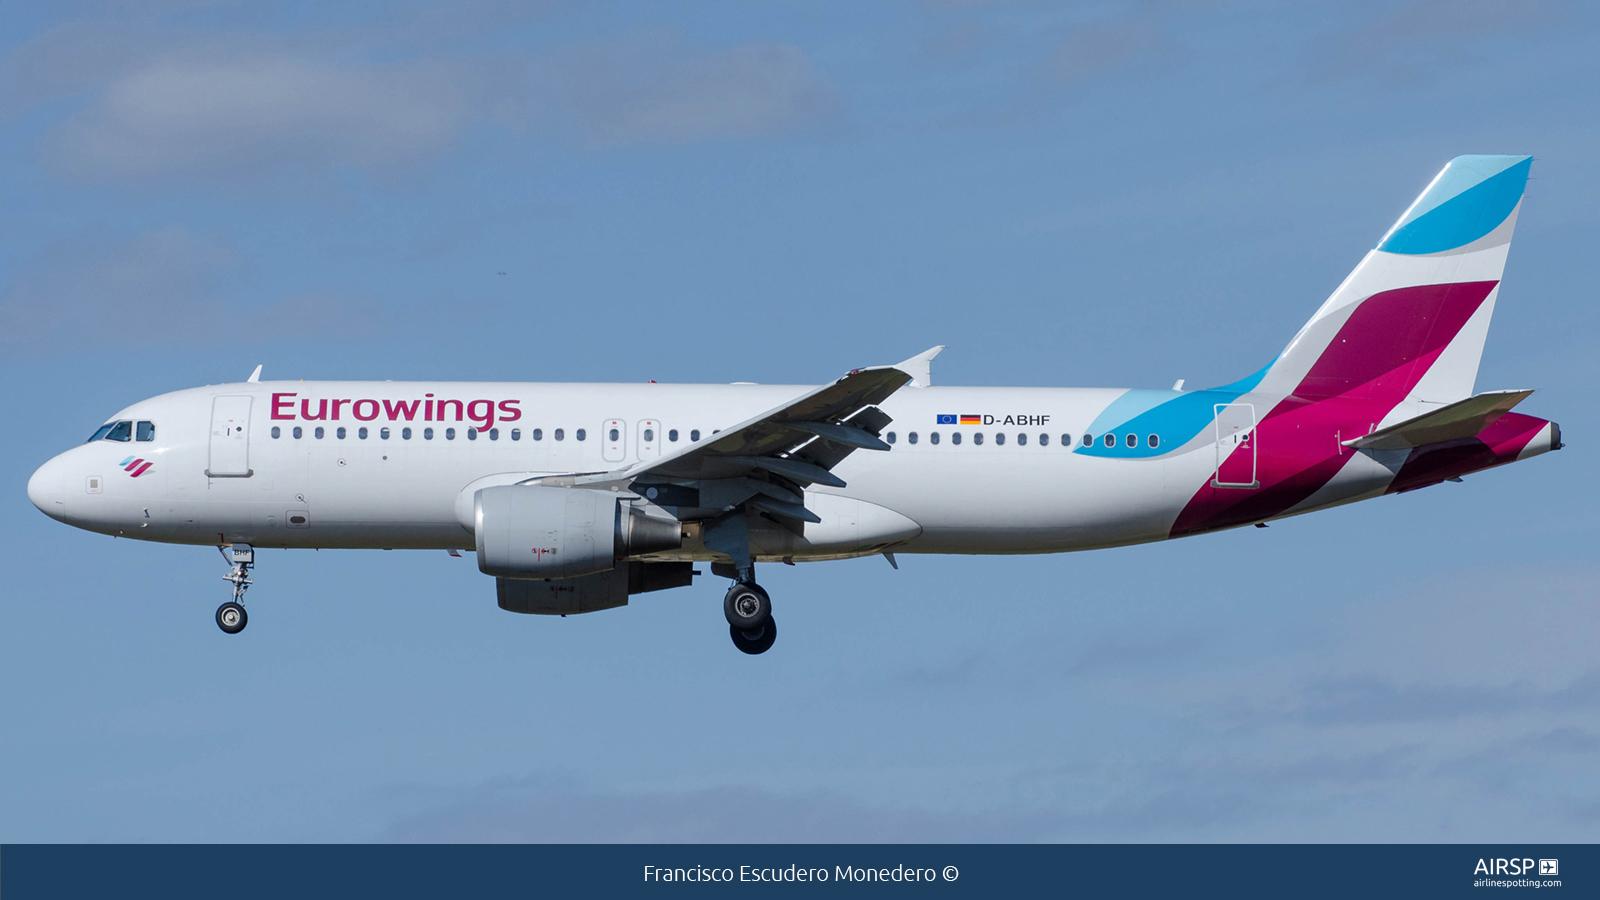 EurowingsAirbus A320D-ABHF